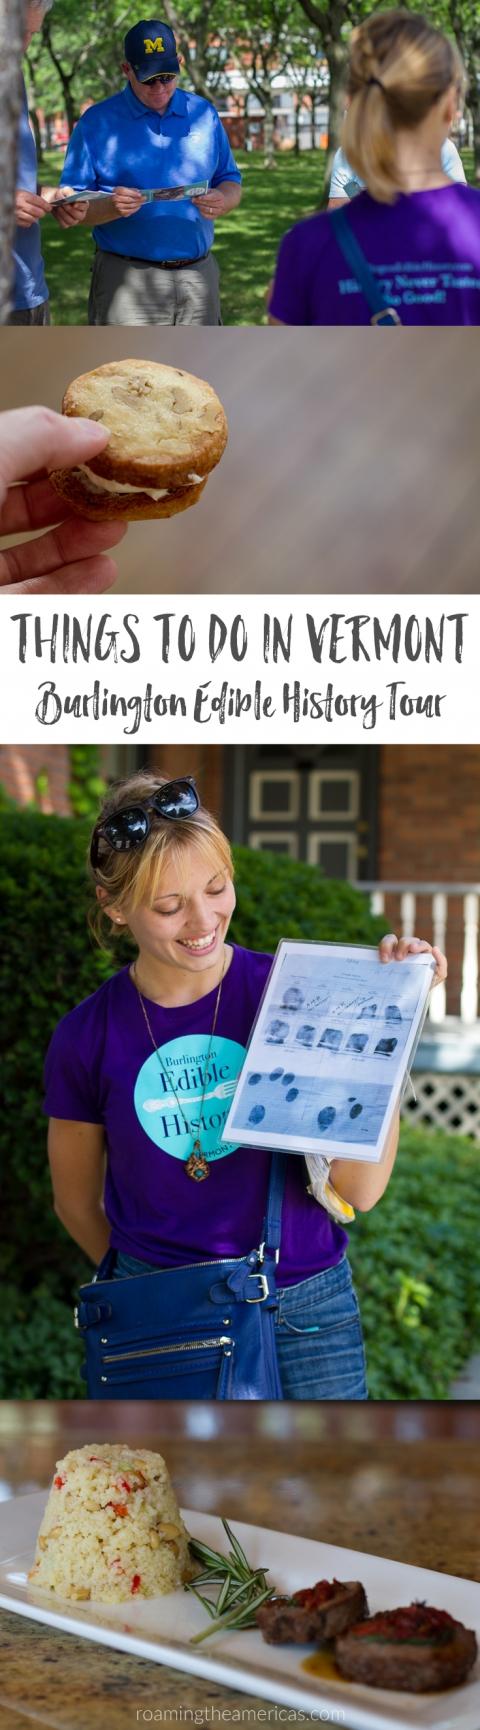 Burlington, Vermont Travel - Things to do in Vermont - Burlington Edible History Tour - walking food tours @roamtheamericas